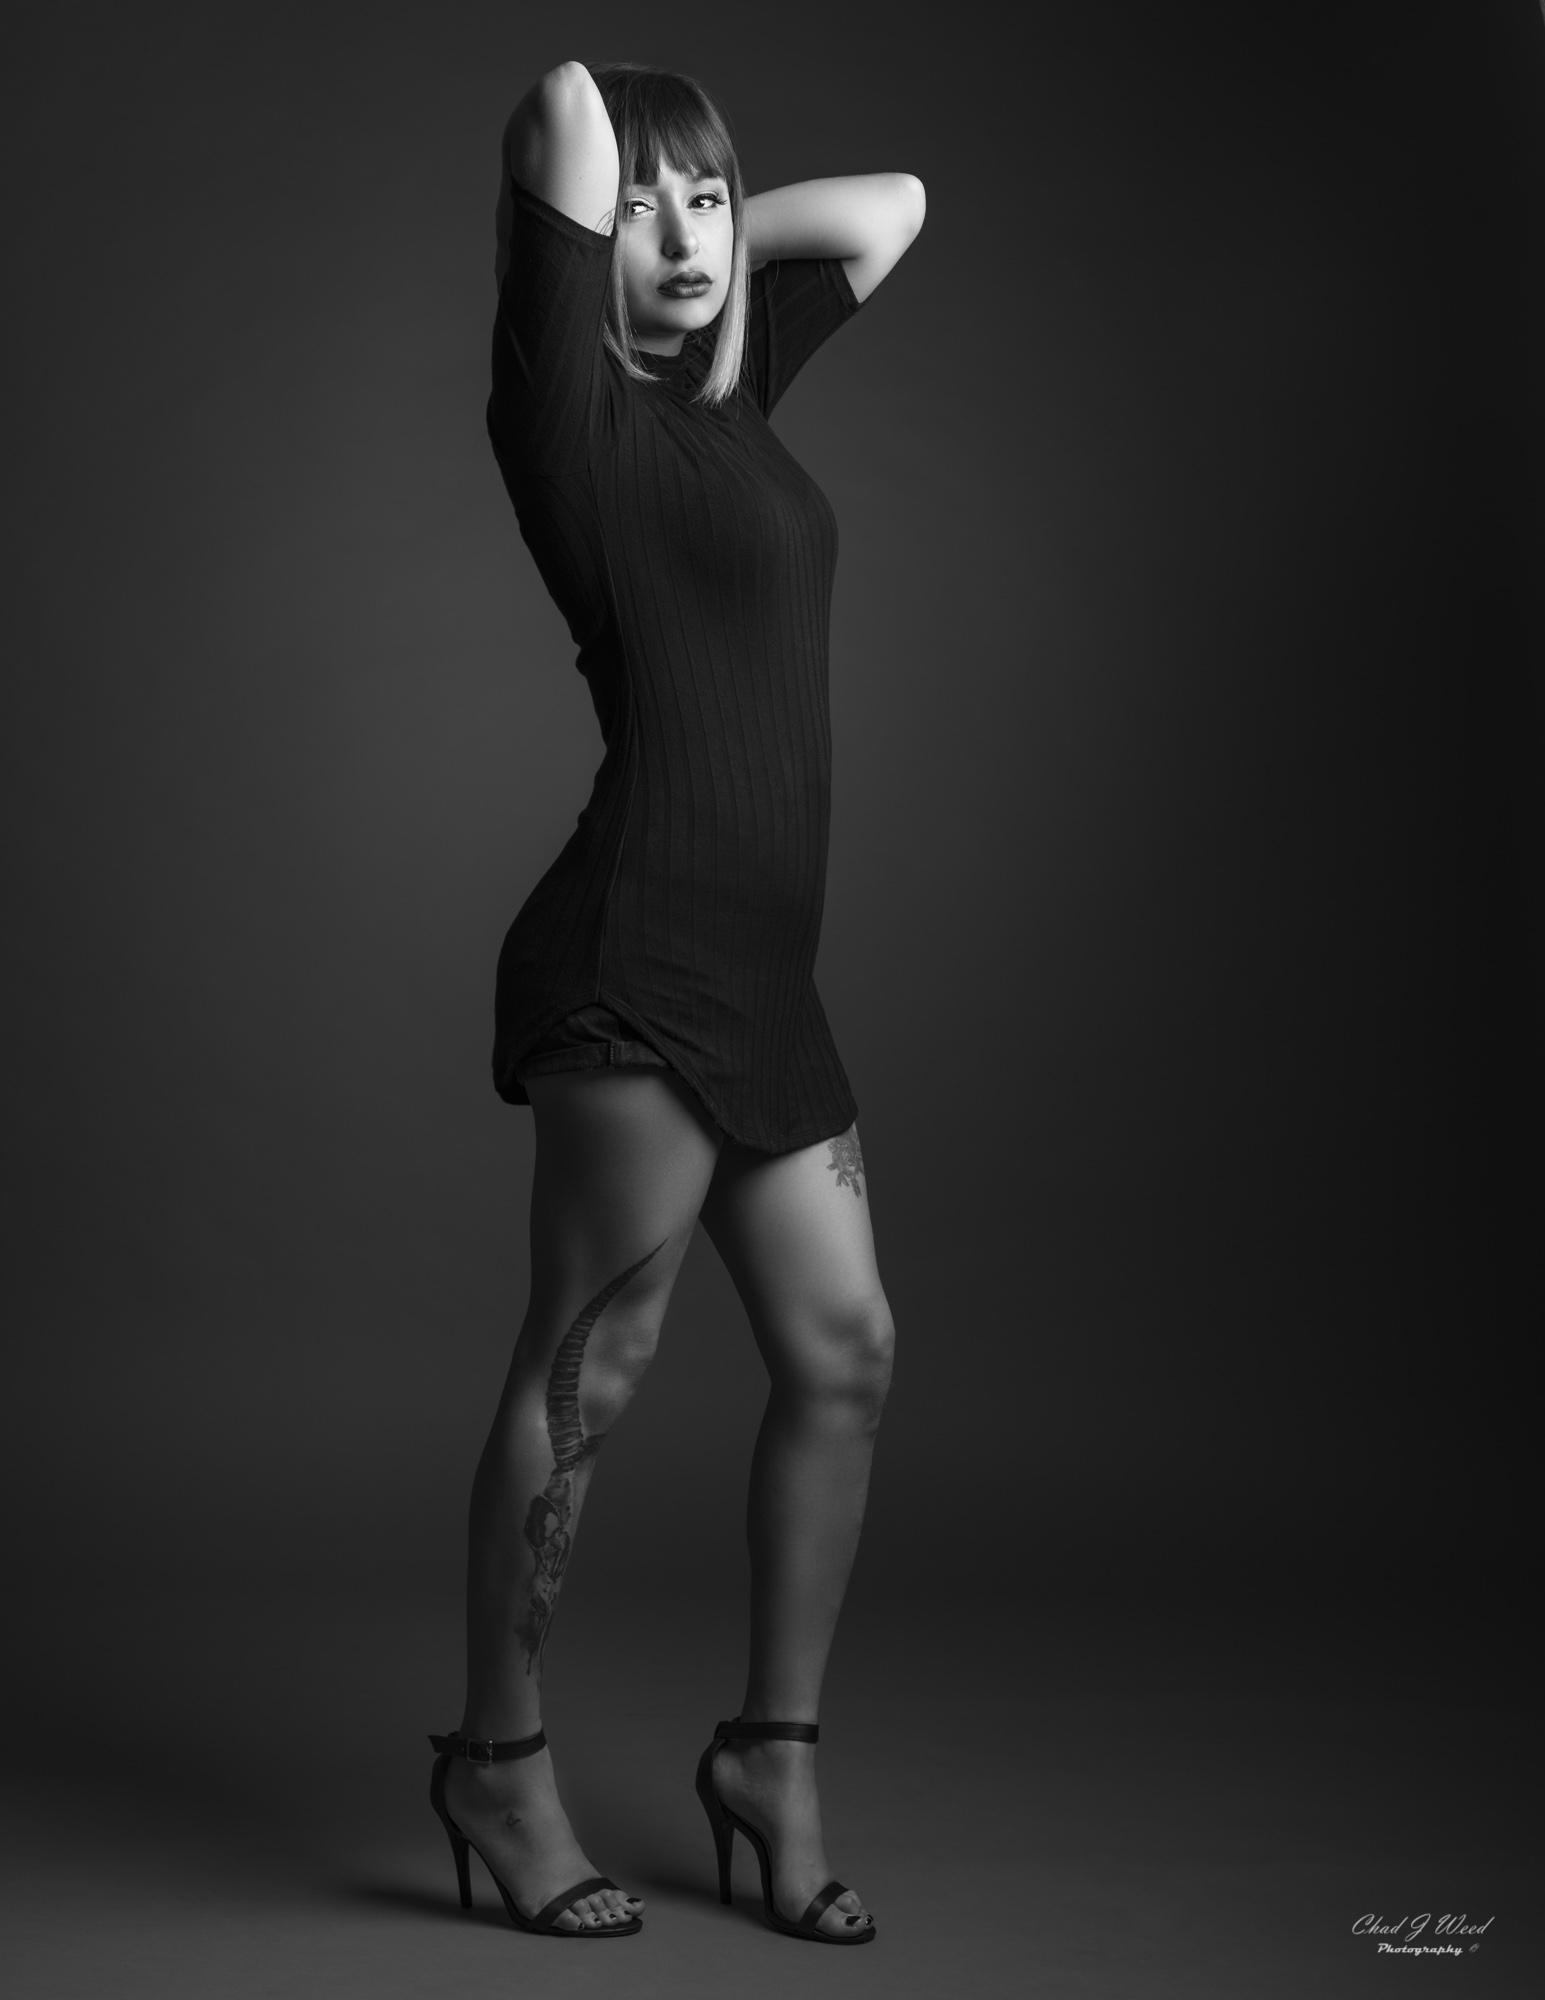 Myrian Fashion Model by Mesa Arizona Portrait Photographer Chad Weed